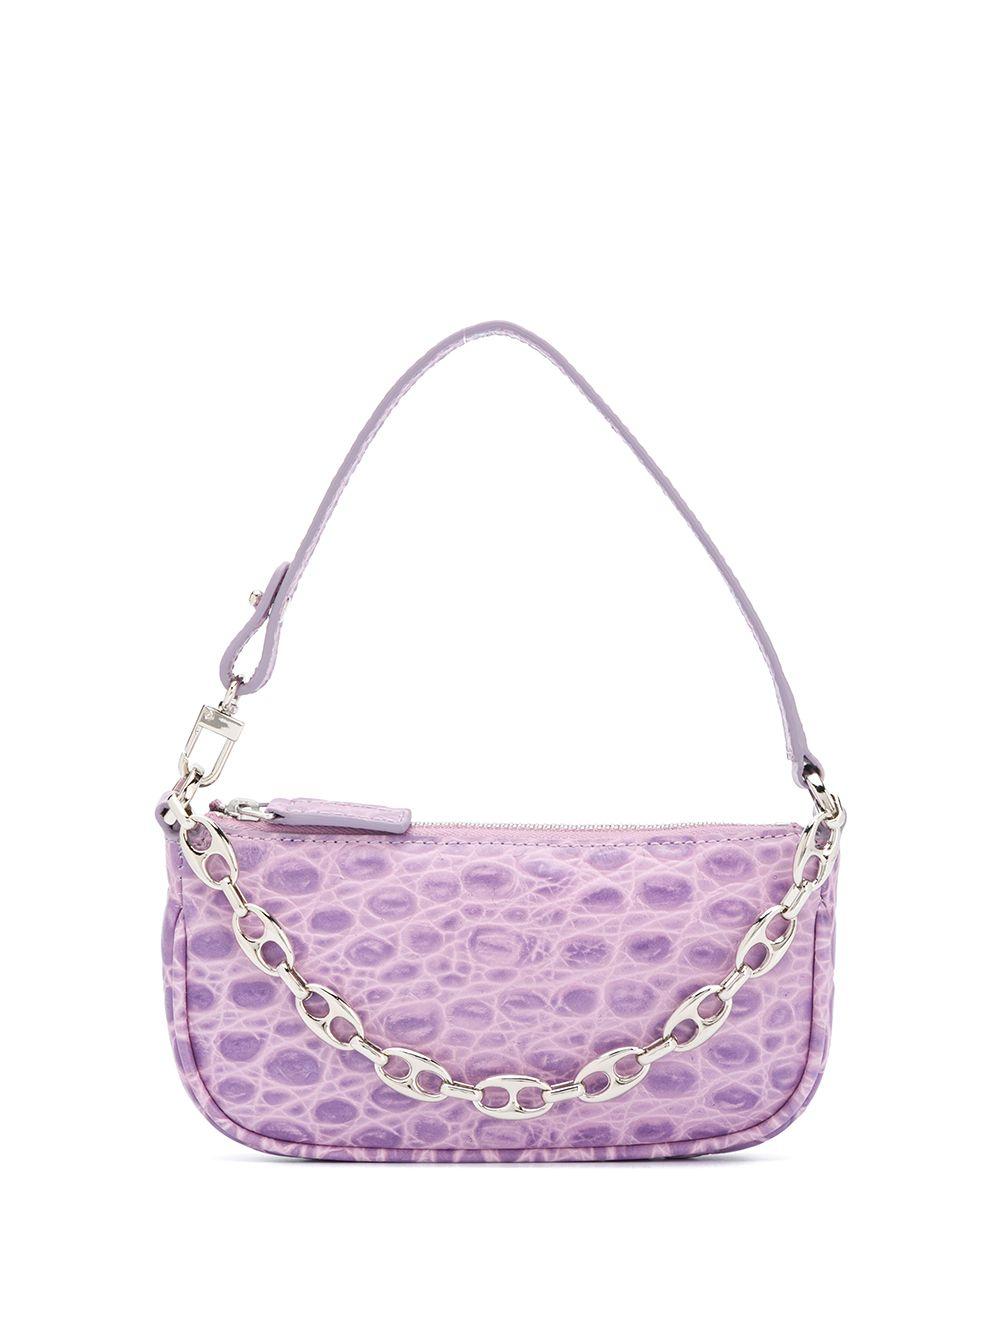 Rachel leather bag